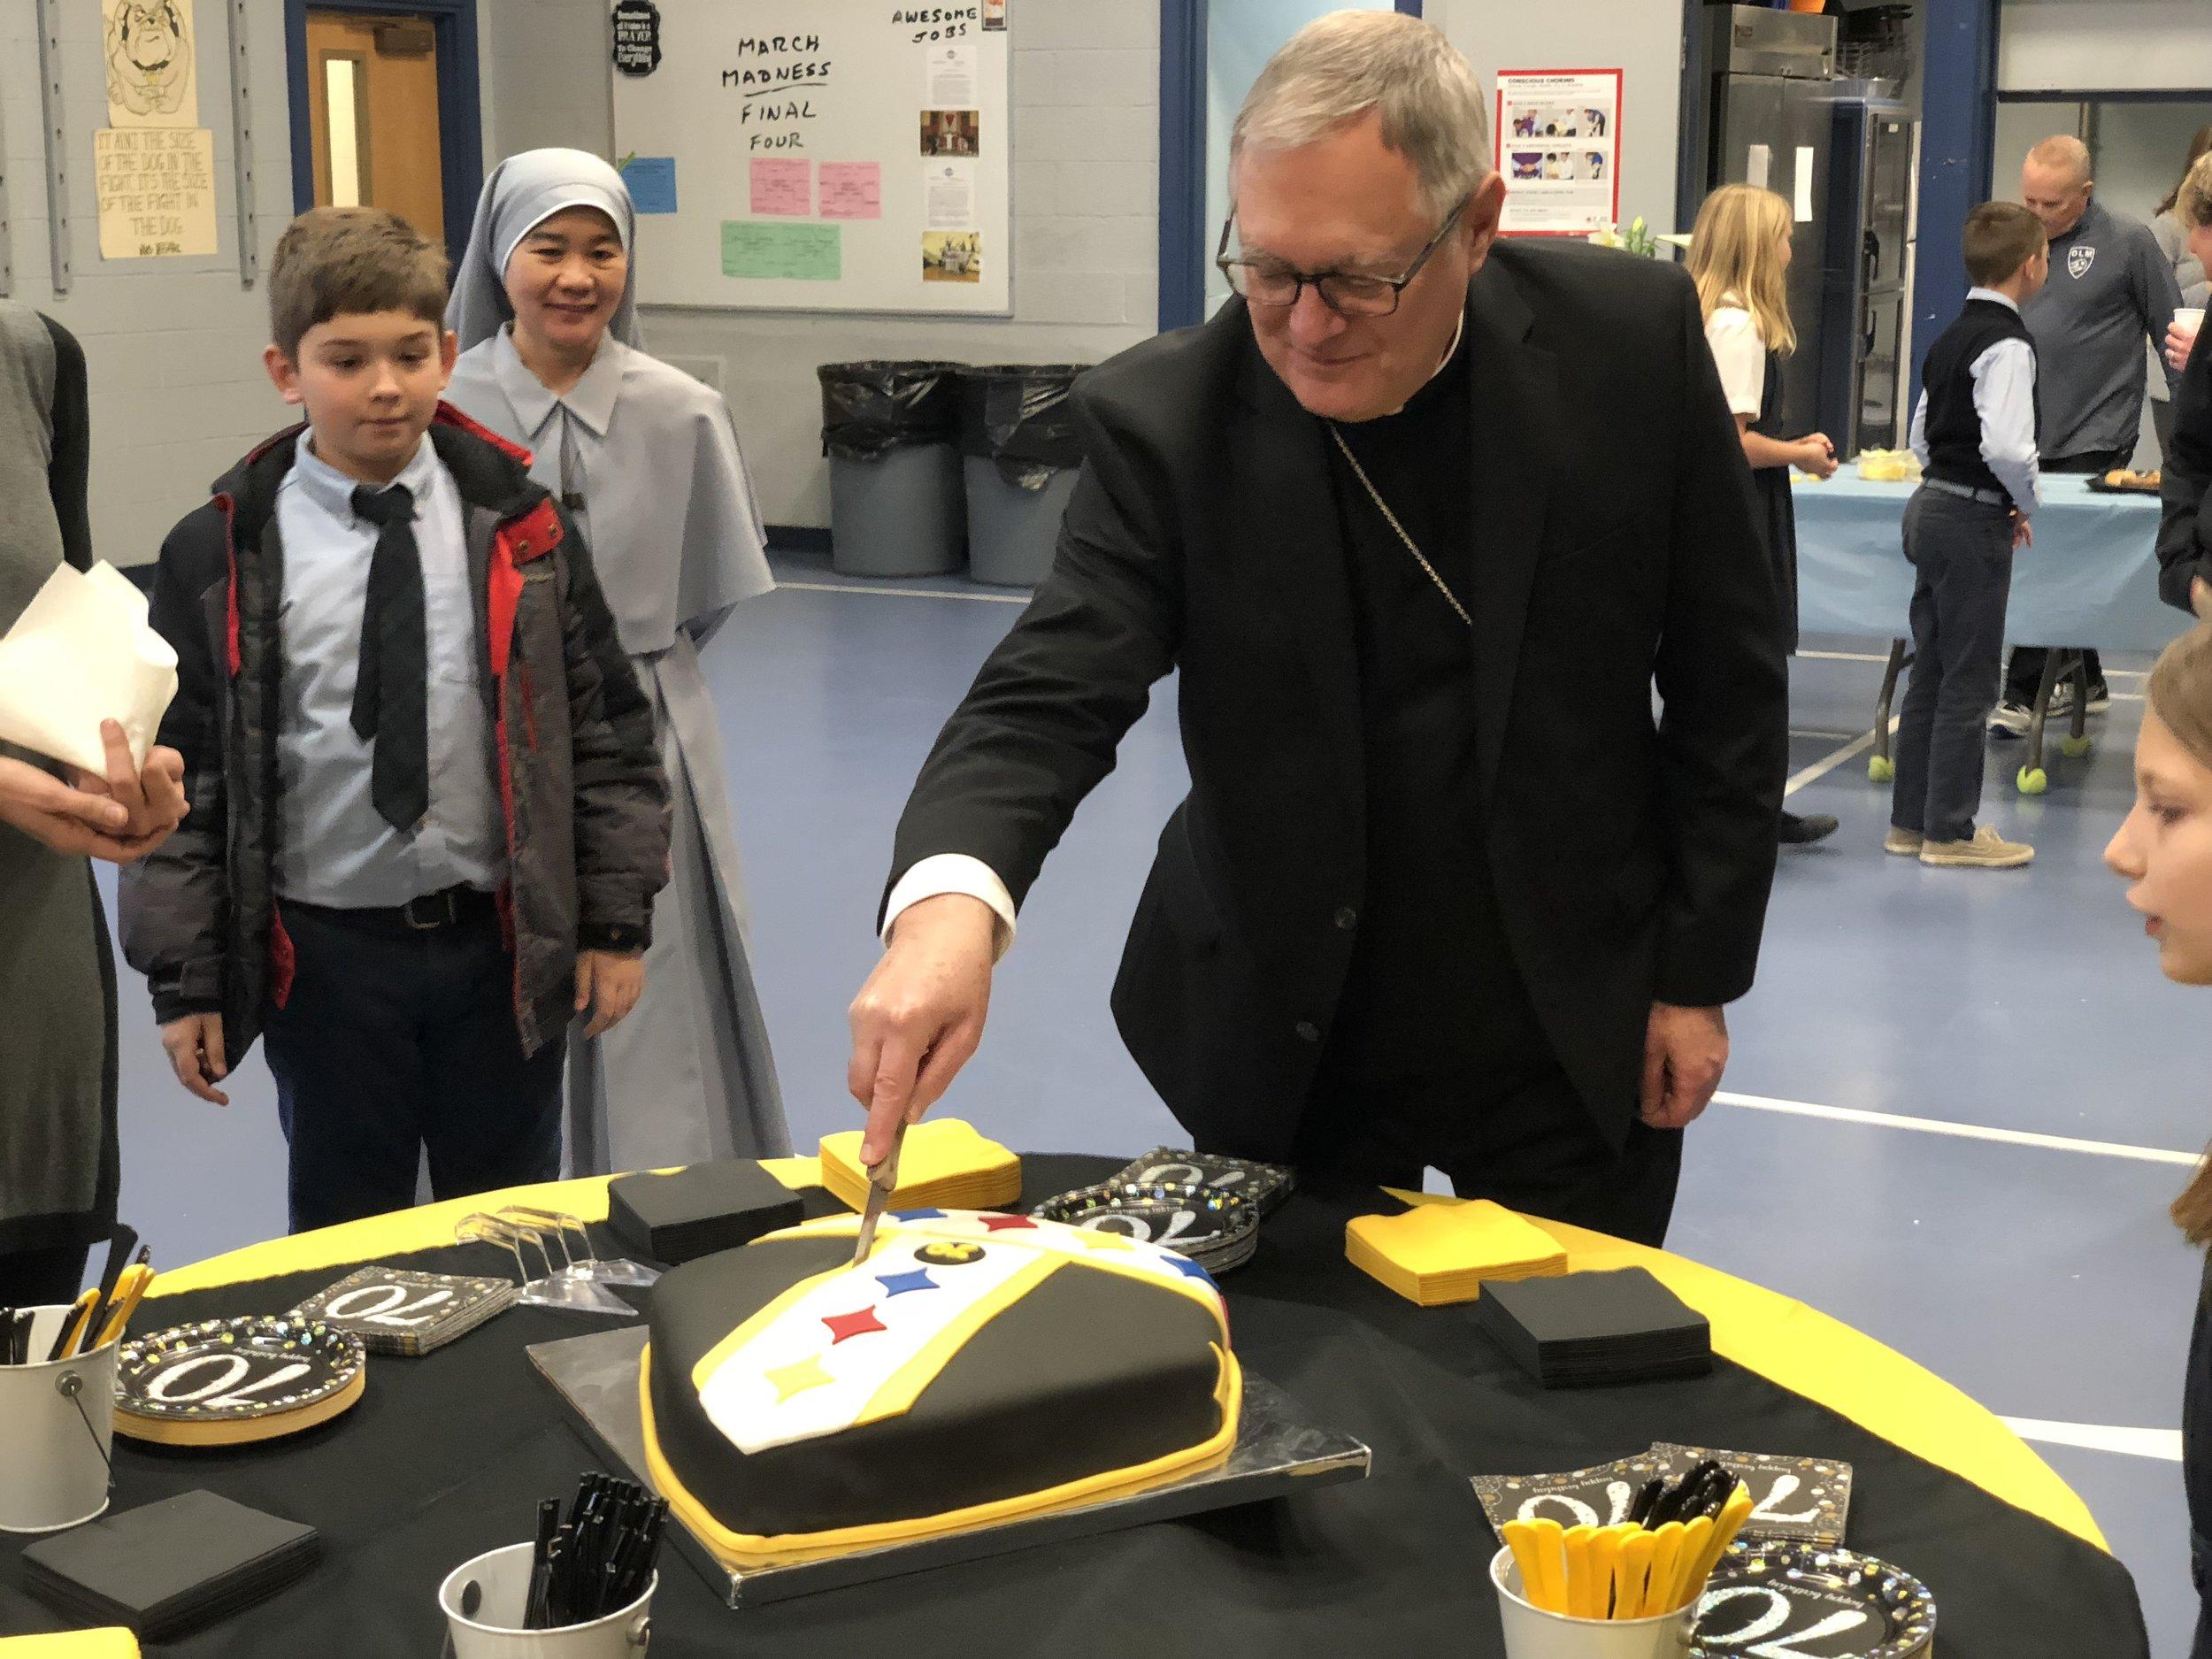 Bishop Tobin happily cuts his birthday cake!